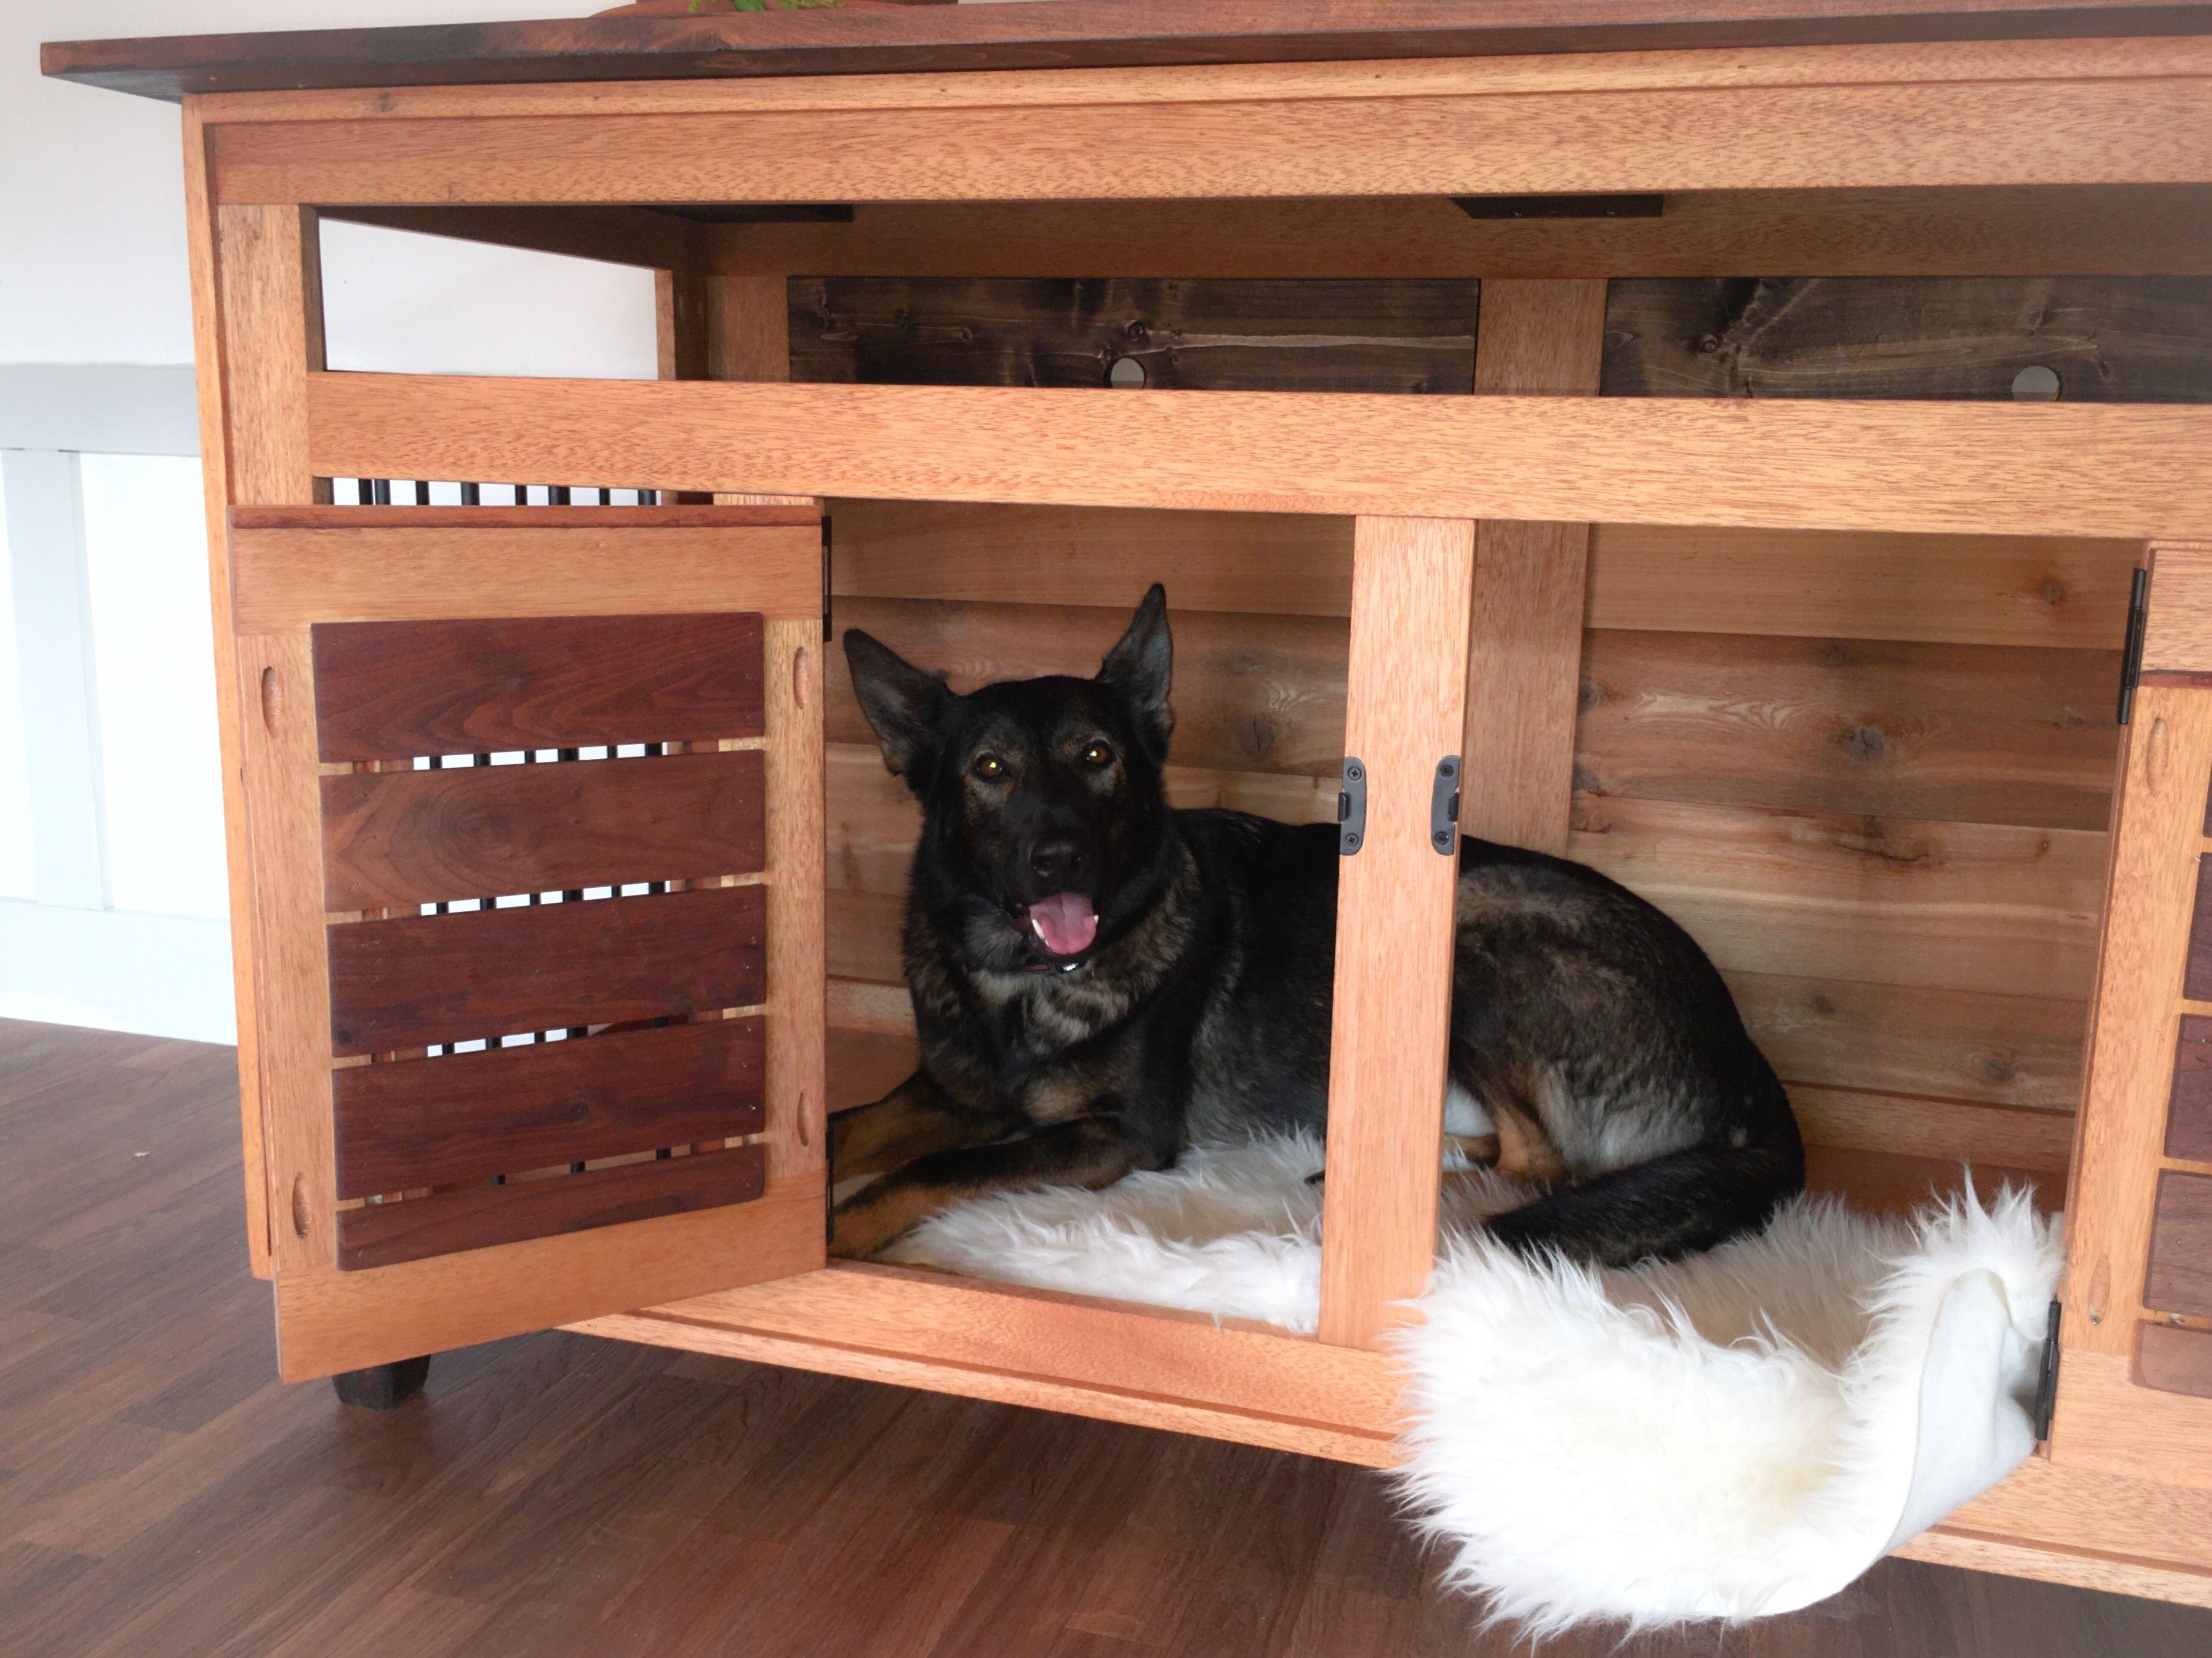 KK Krate U0026 Kennel Charlotte NC Doofus House Pet House Pet Furniture Dog  Crate Kennel Custom